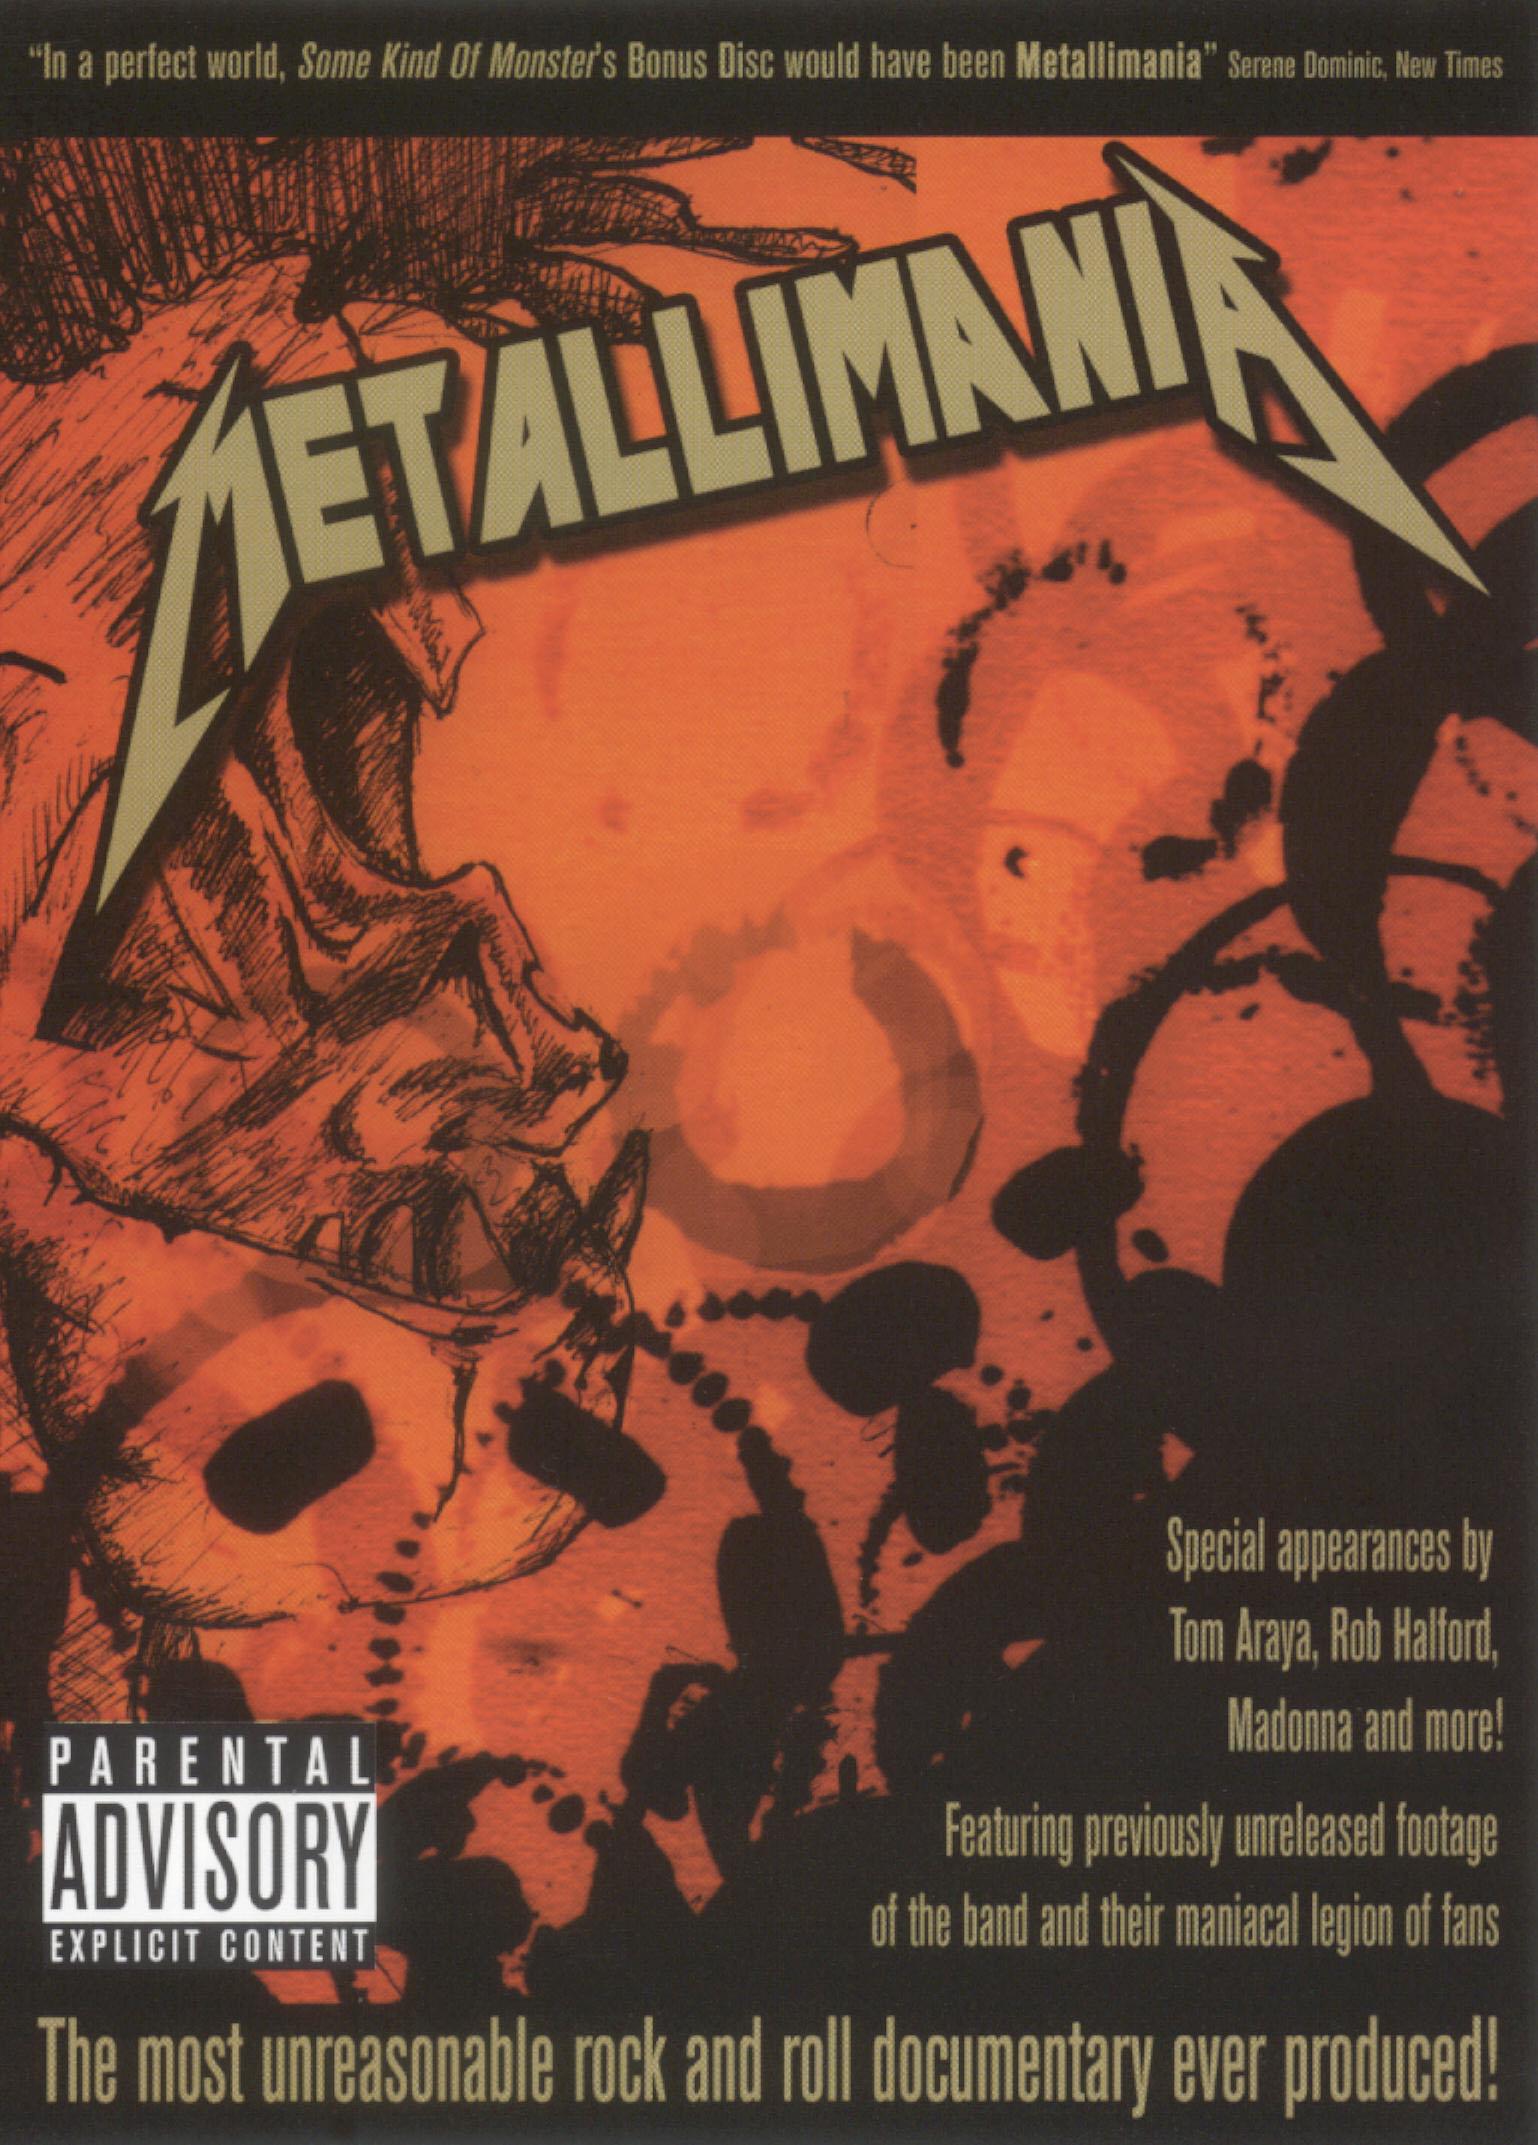 Metallica: Metallimania